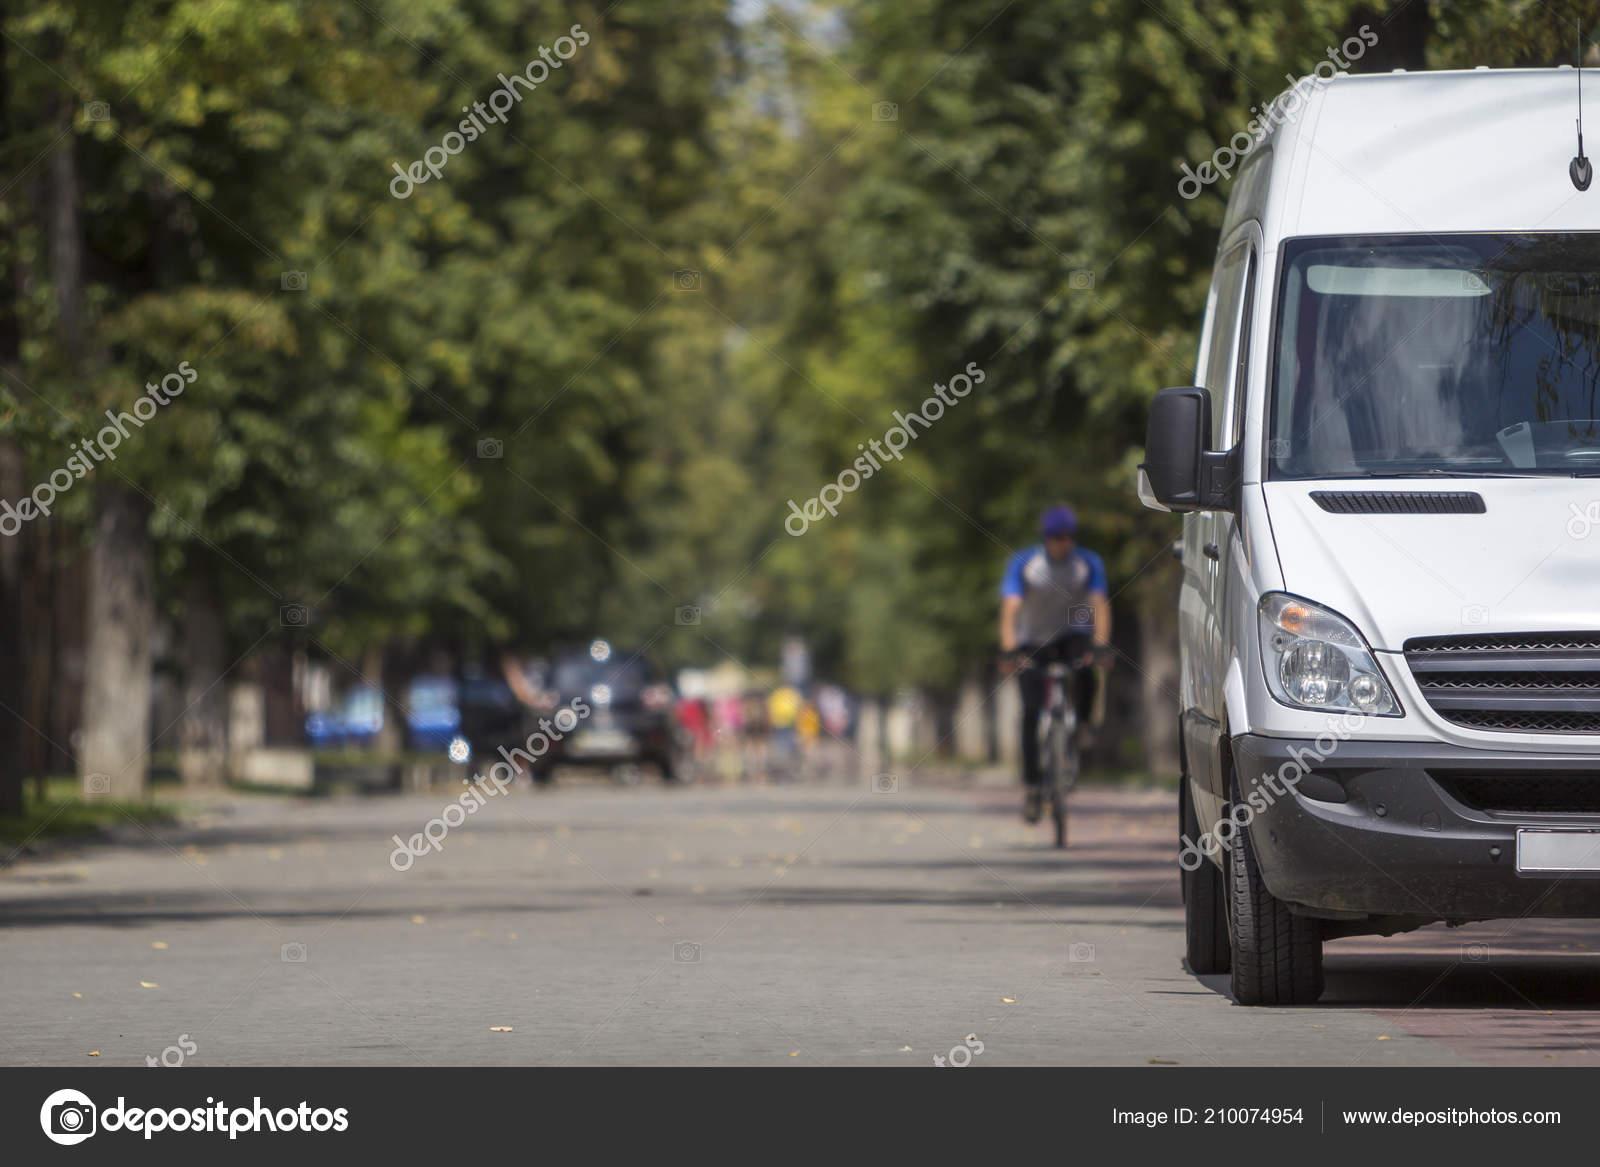 f2c59364fe White Passenger Medium Size Commercial German Luxury Minibus Van Parked —  Stock Photo